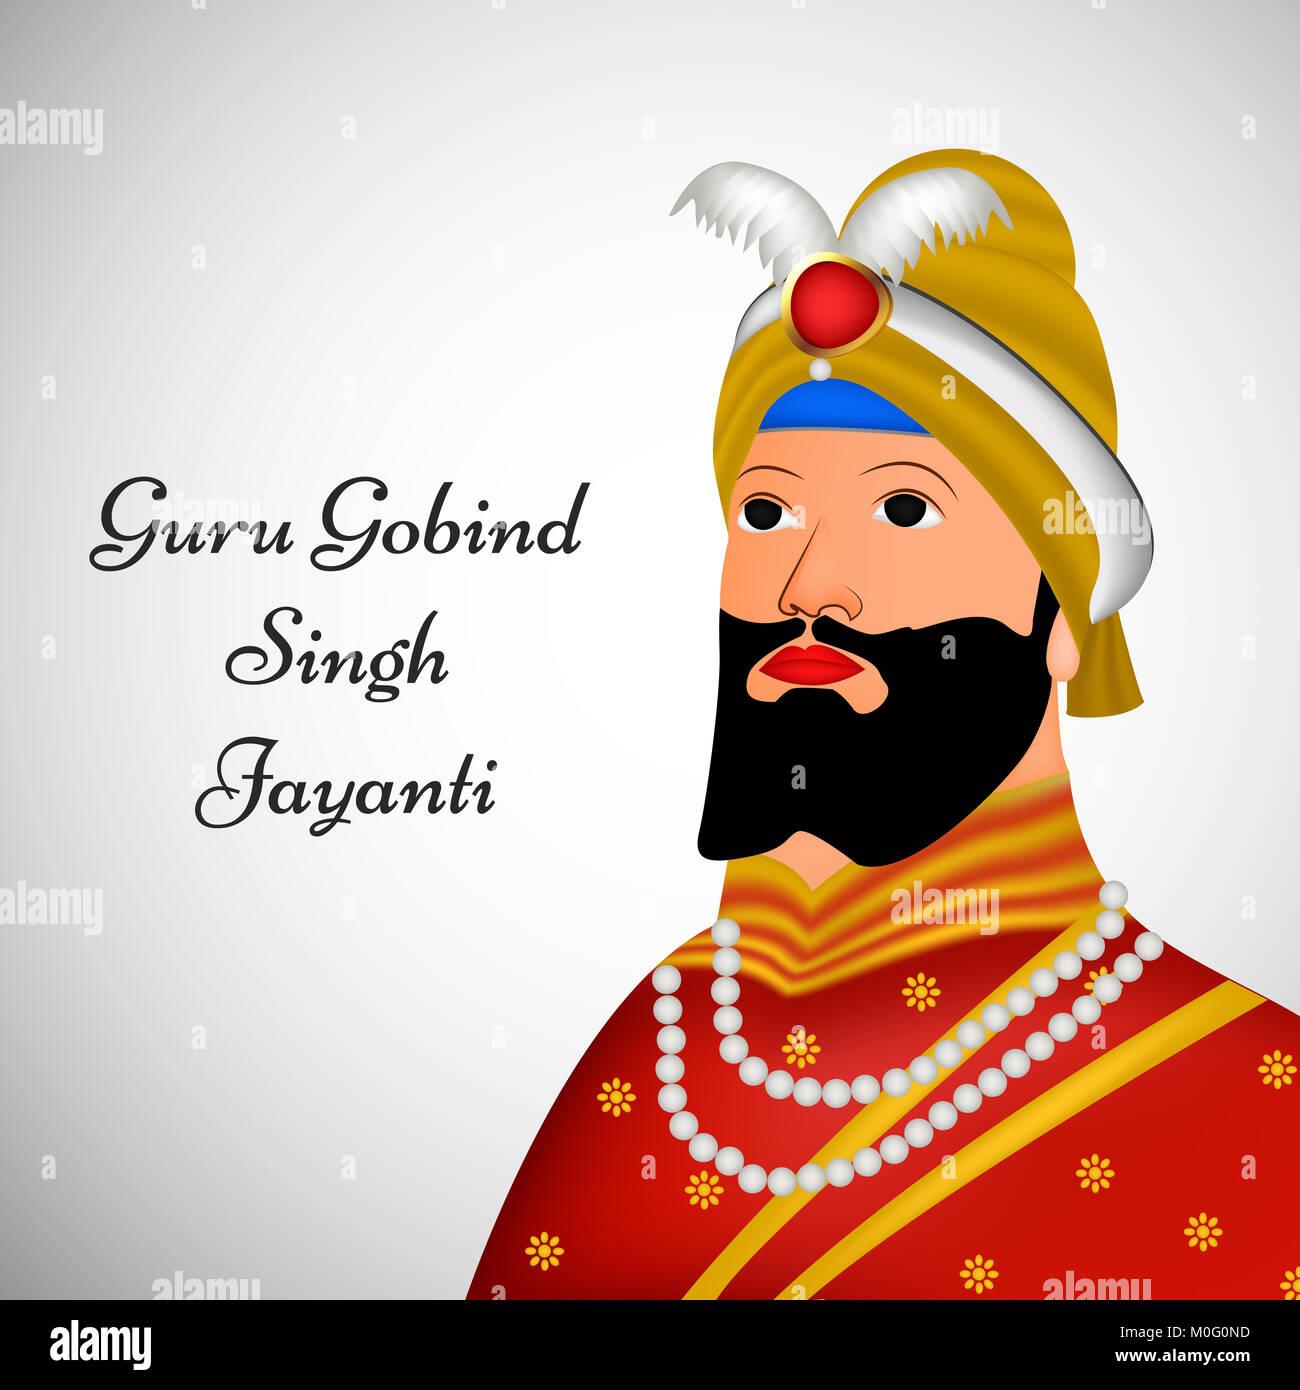 Guru Gobind Singh Birthday Stock Photos Guru Gobind Singh Birthday